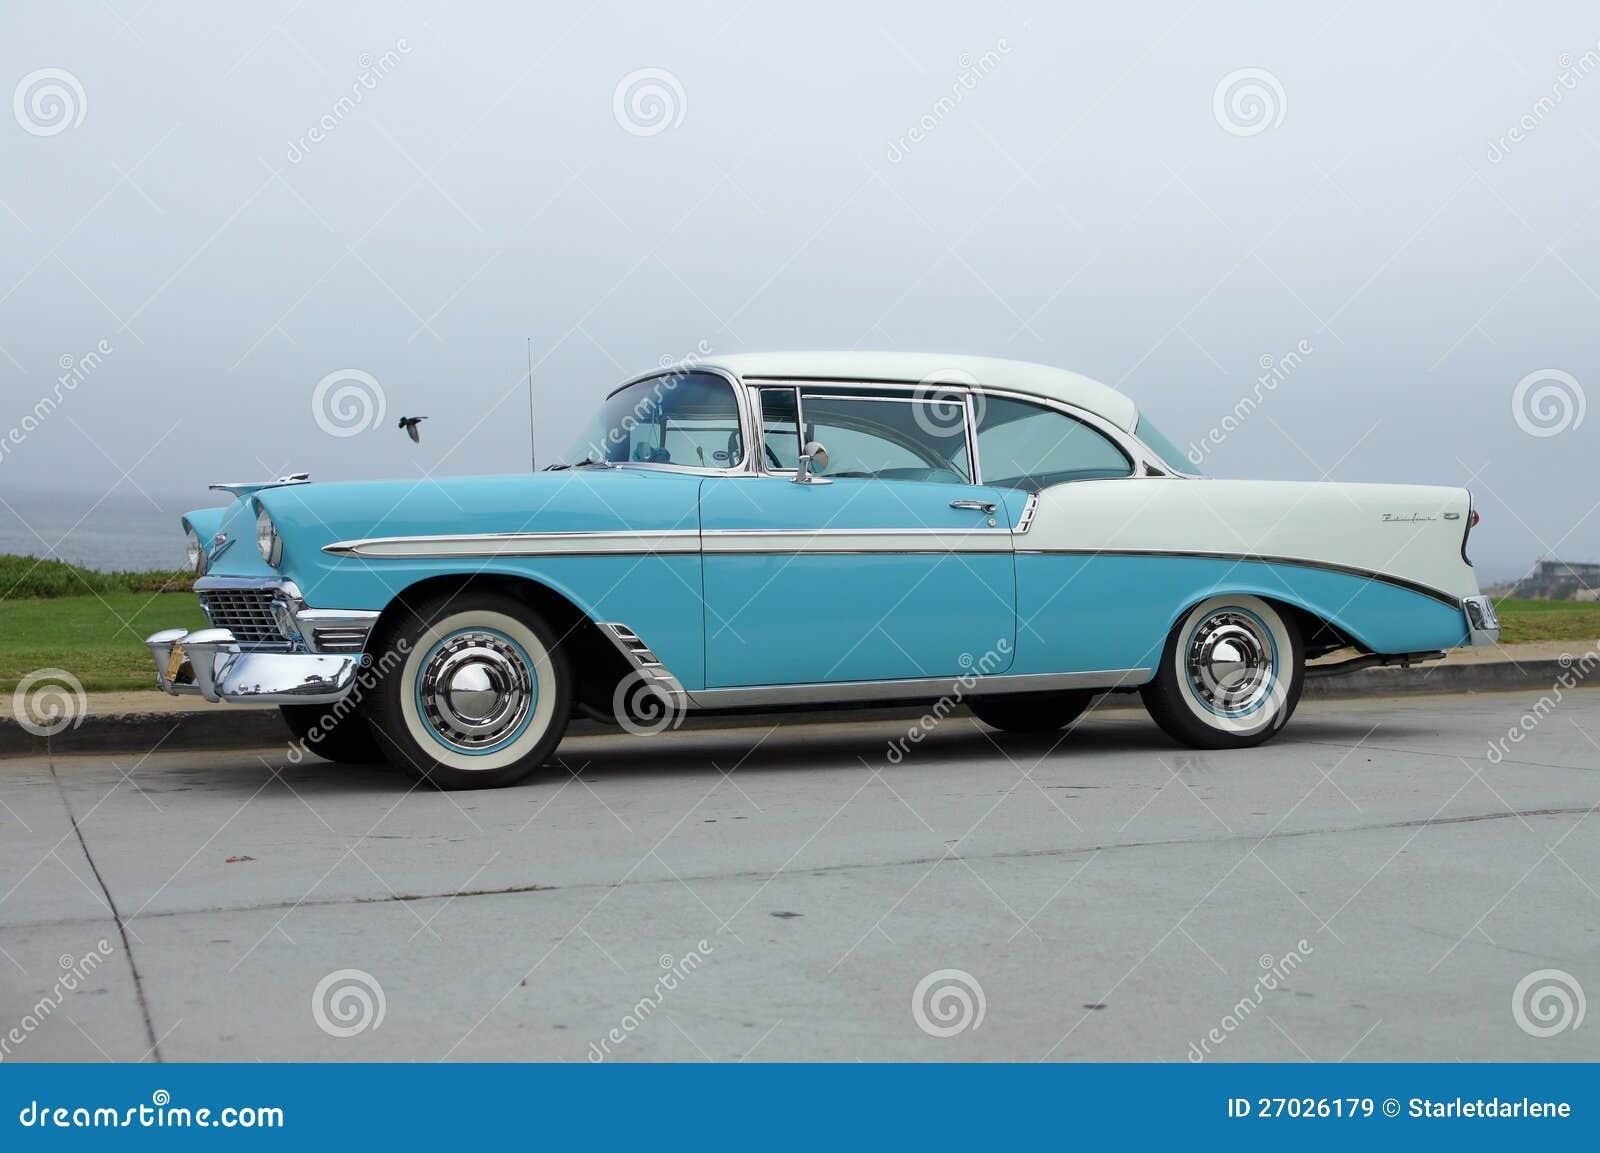 Chevrolet Bel-Air 1956